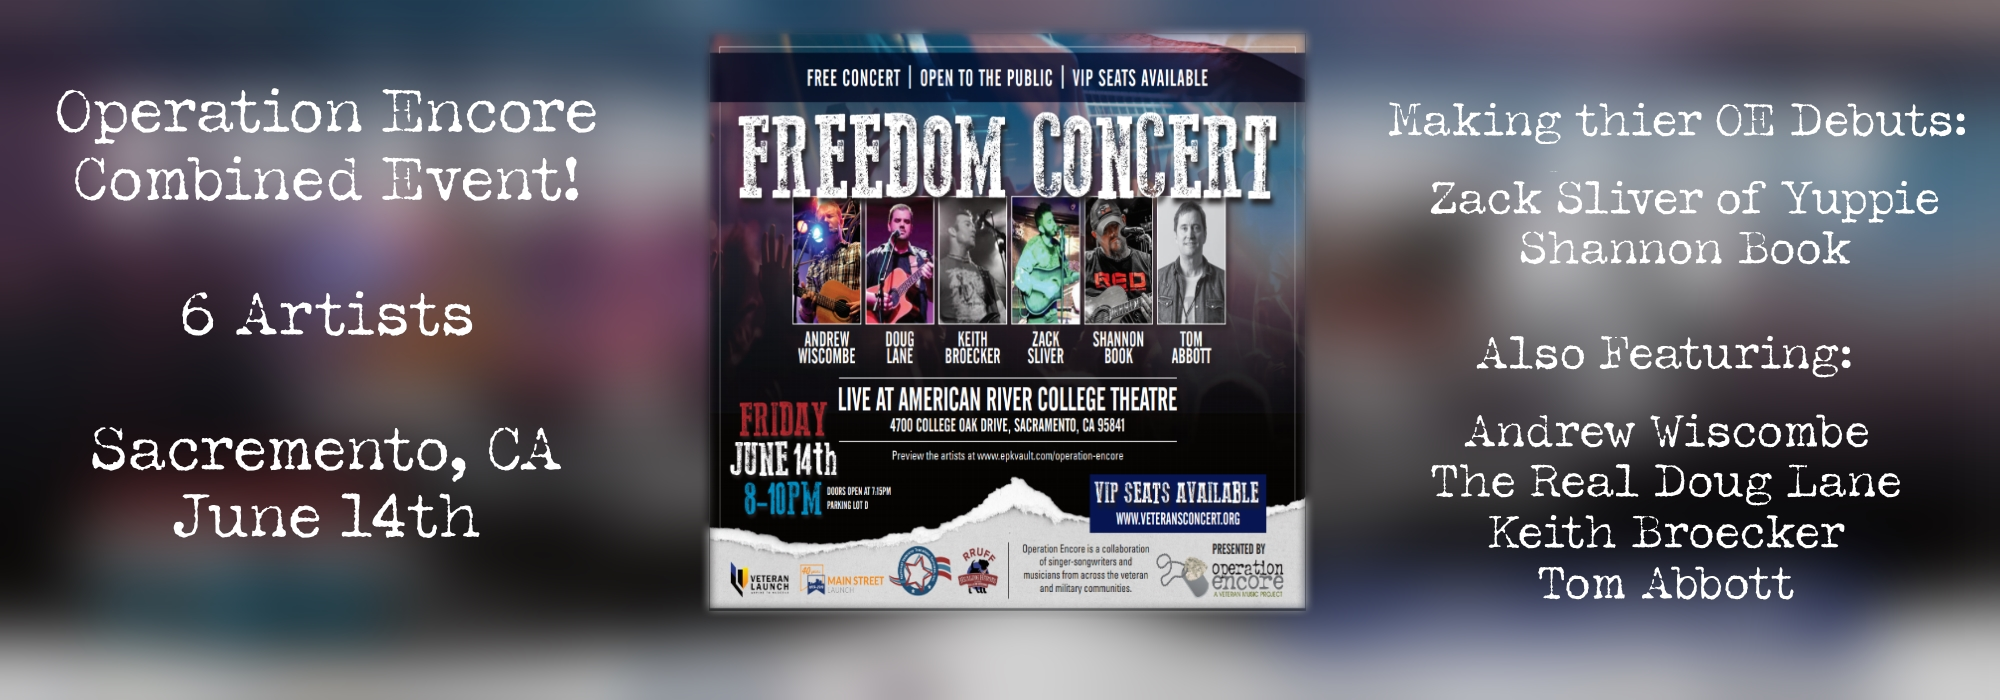 Freedom Concert.jpg